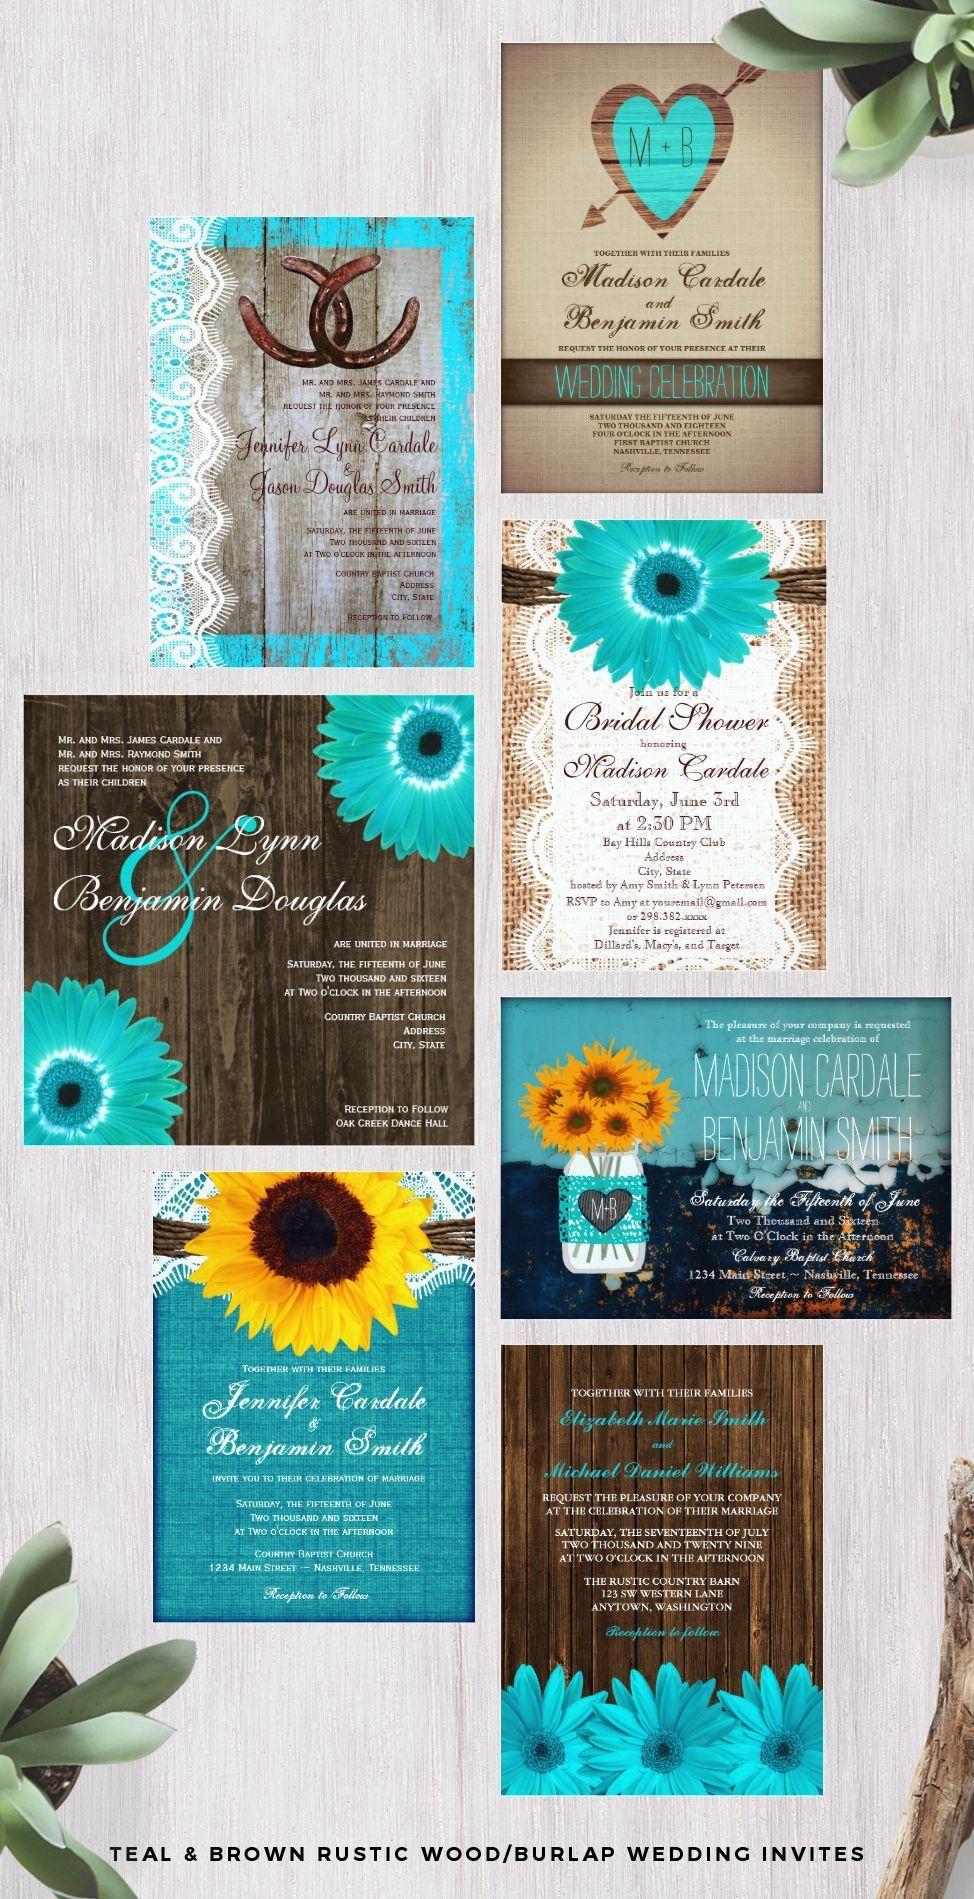 Teal aqua turquoise and brown rustic woodburlap wedding invitations